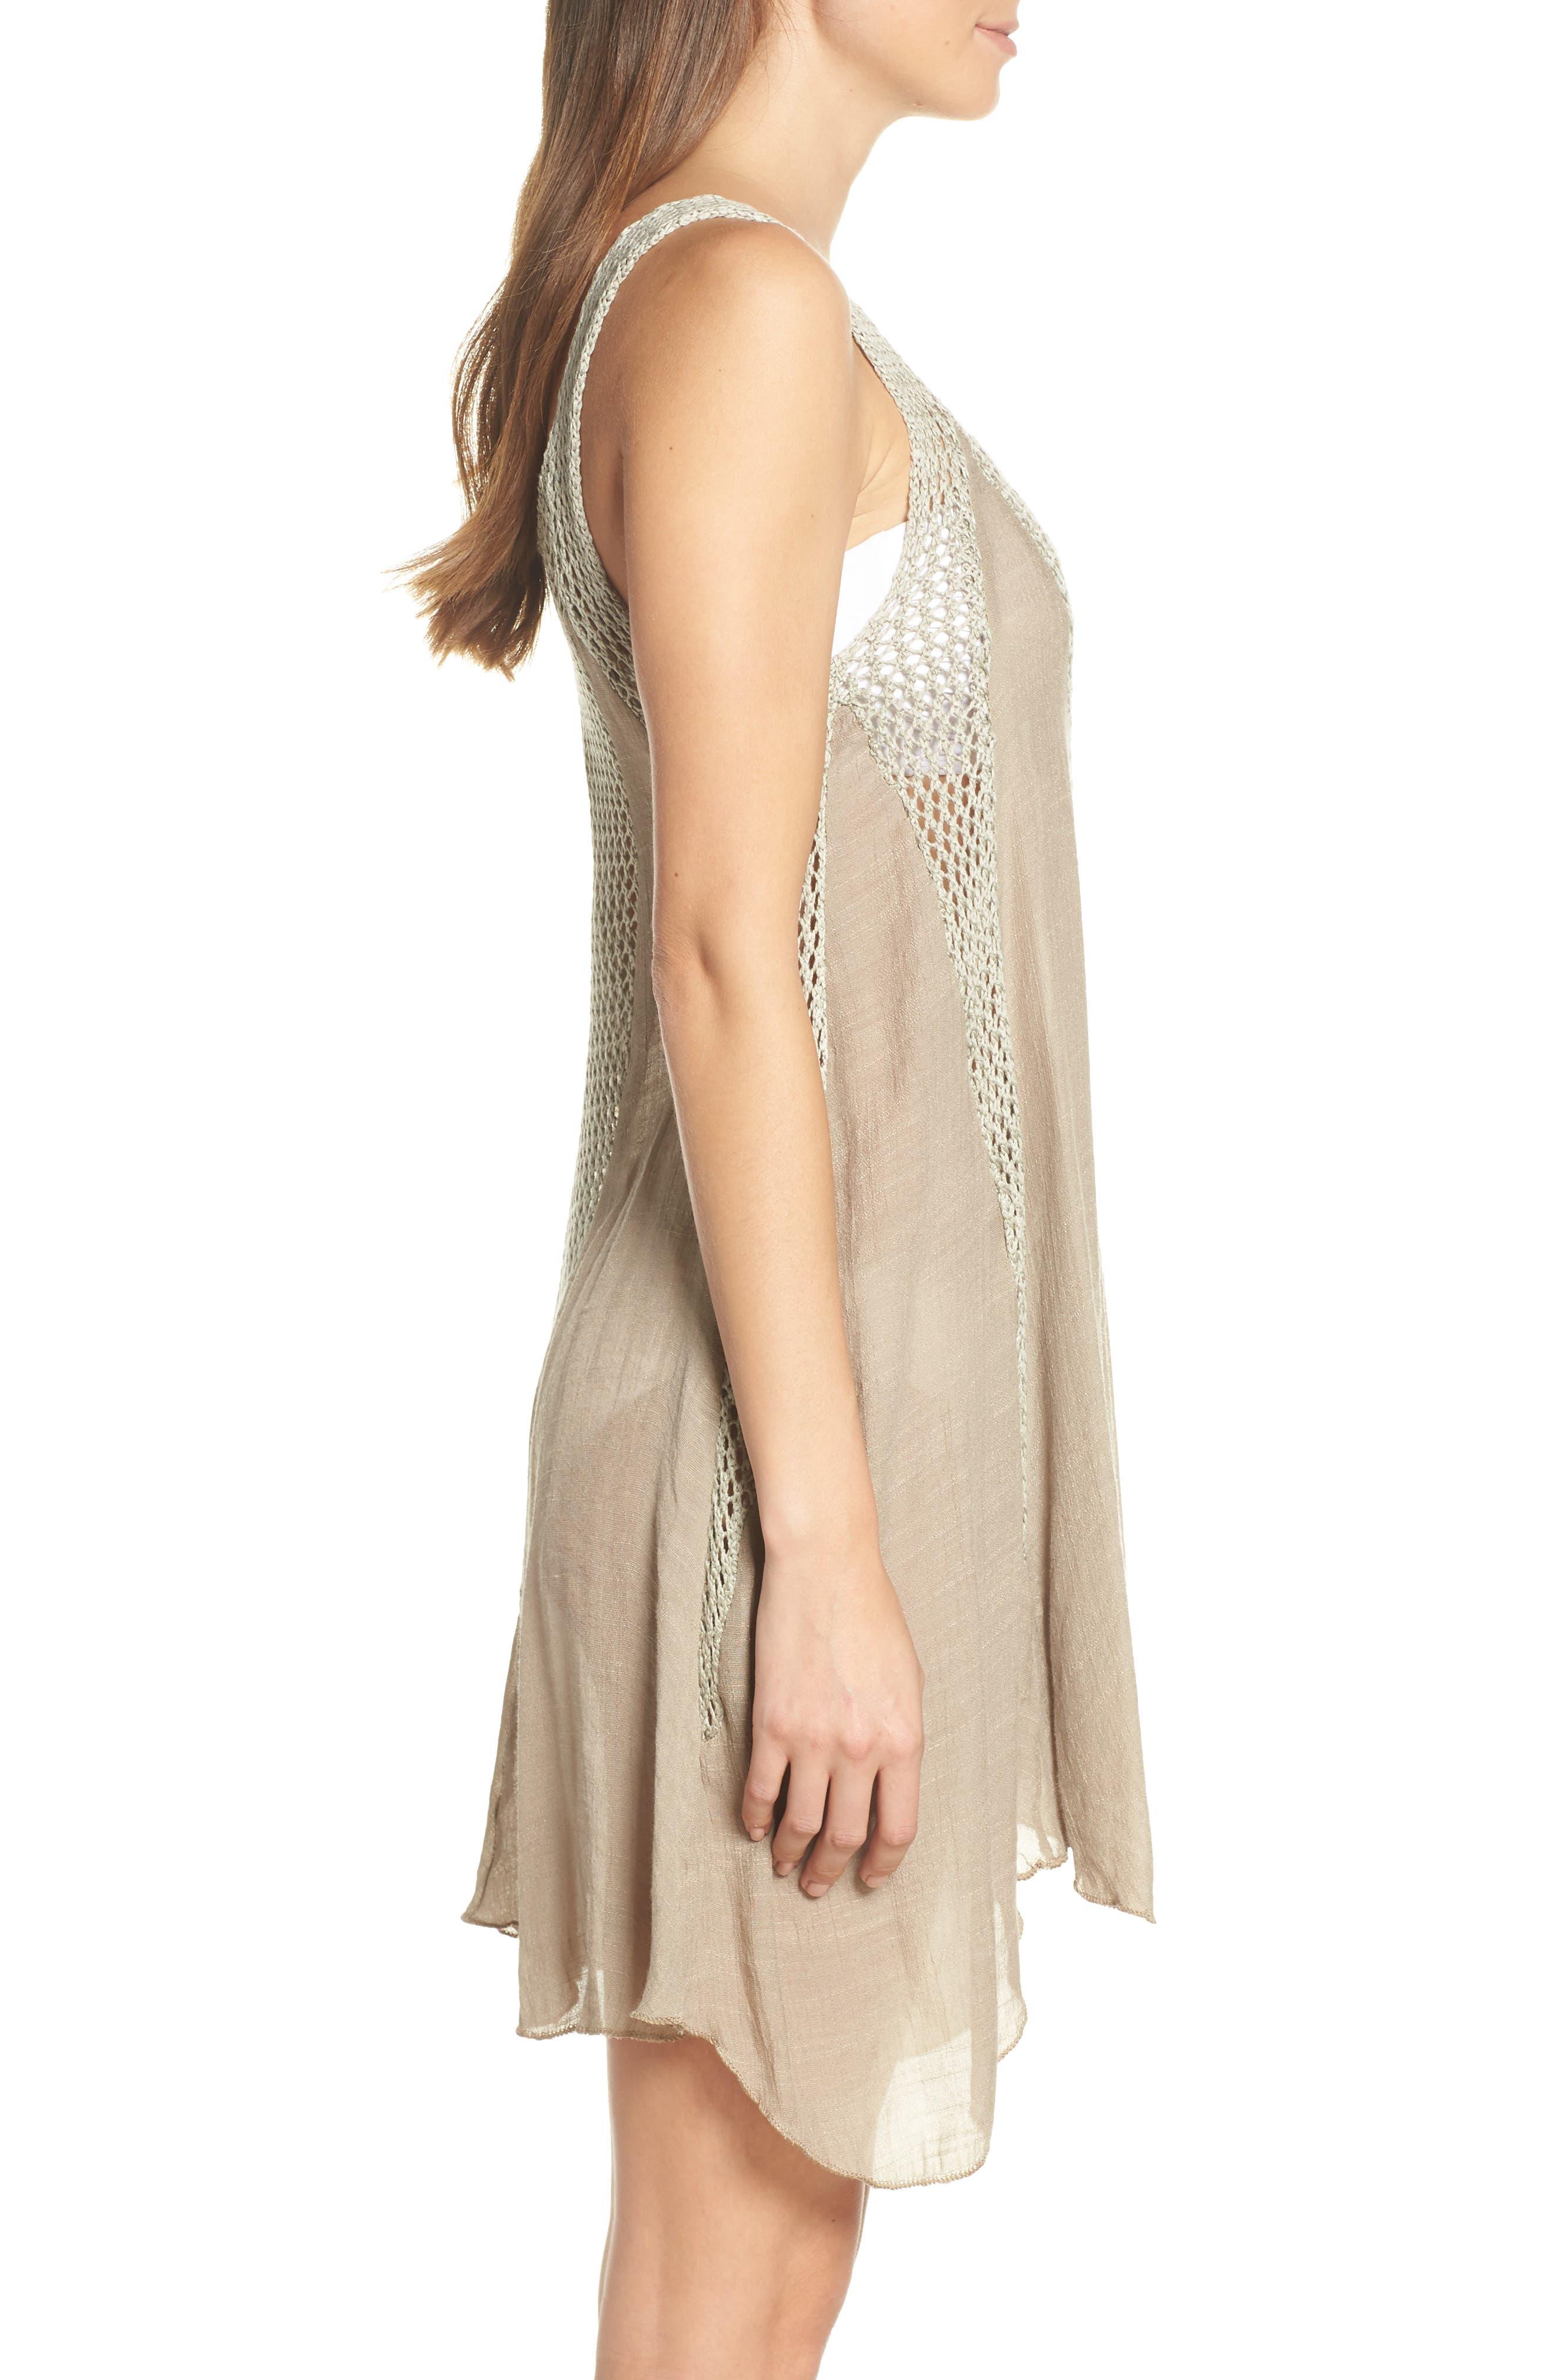 ELAN, Crochet Inset Cover-Up Dress, Alternate thumbnail 4, color, SAGE